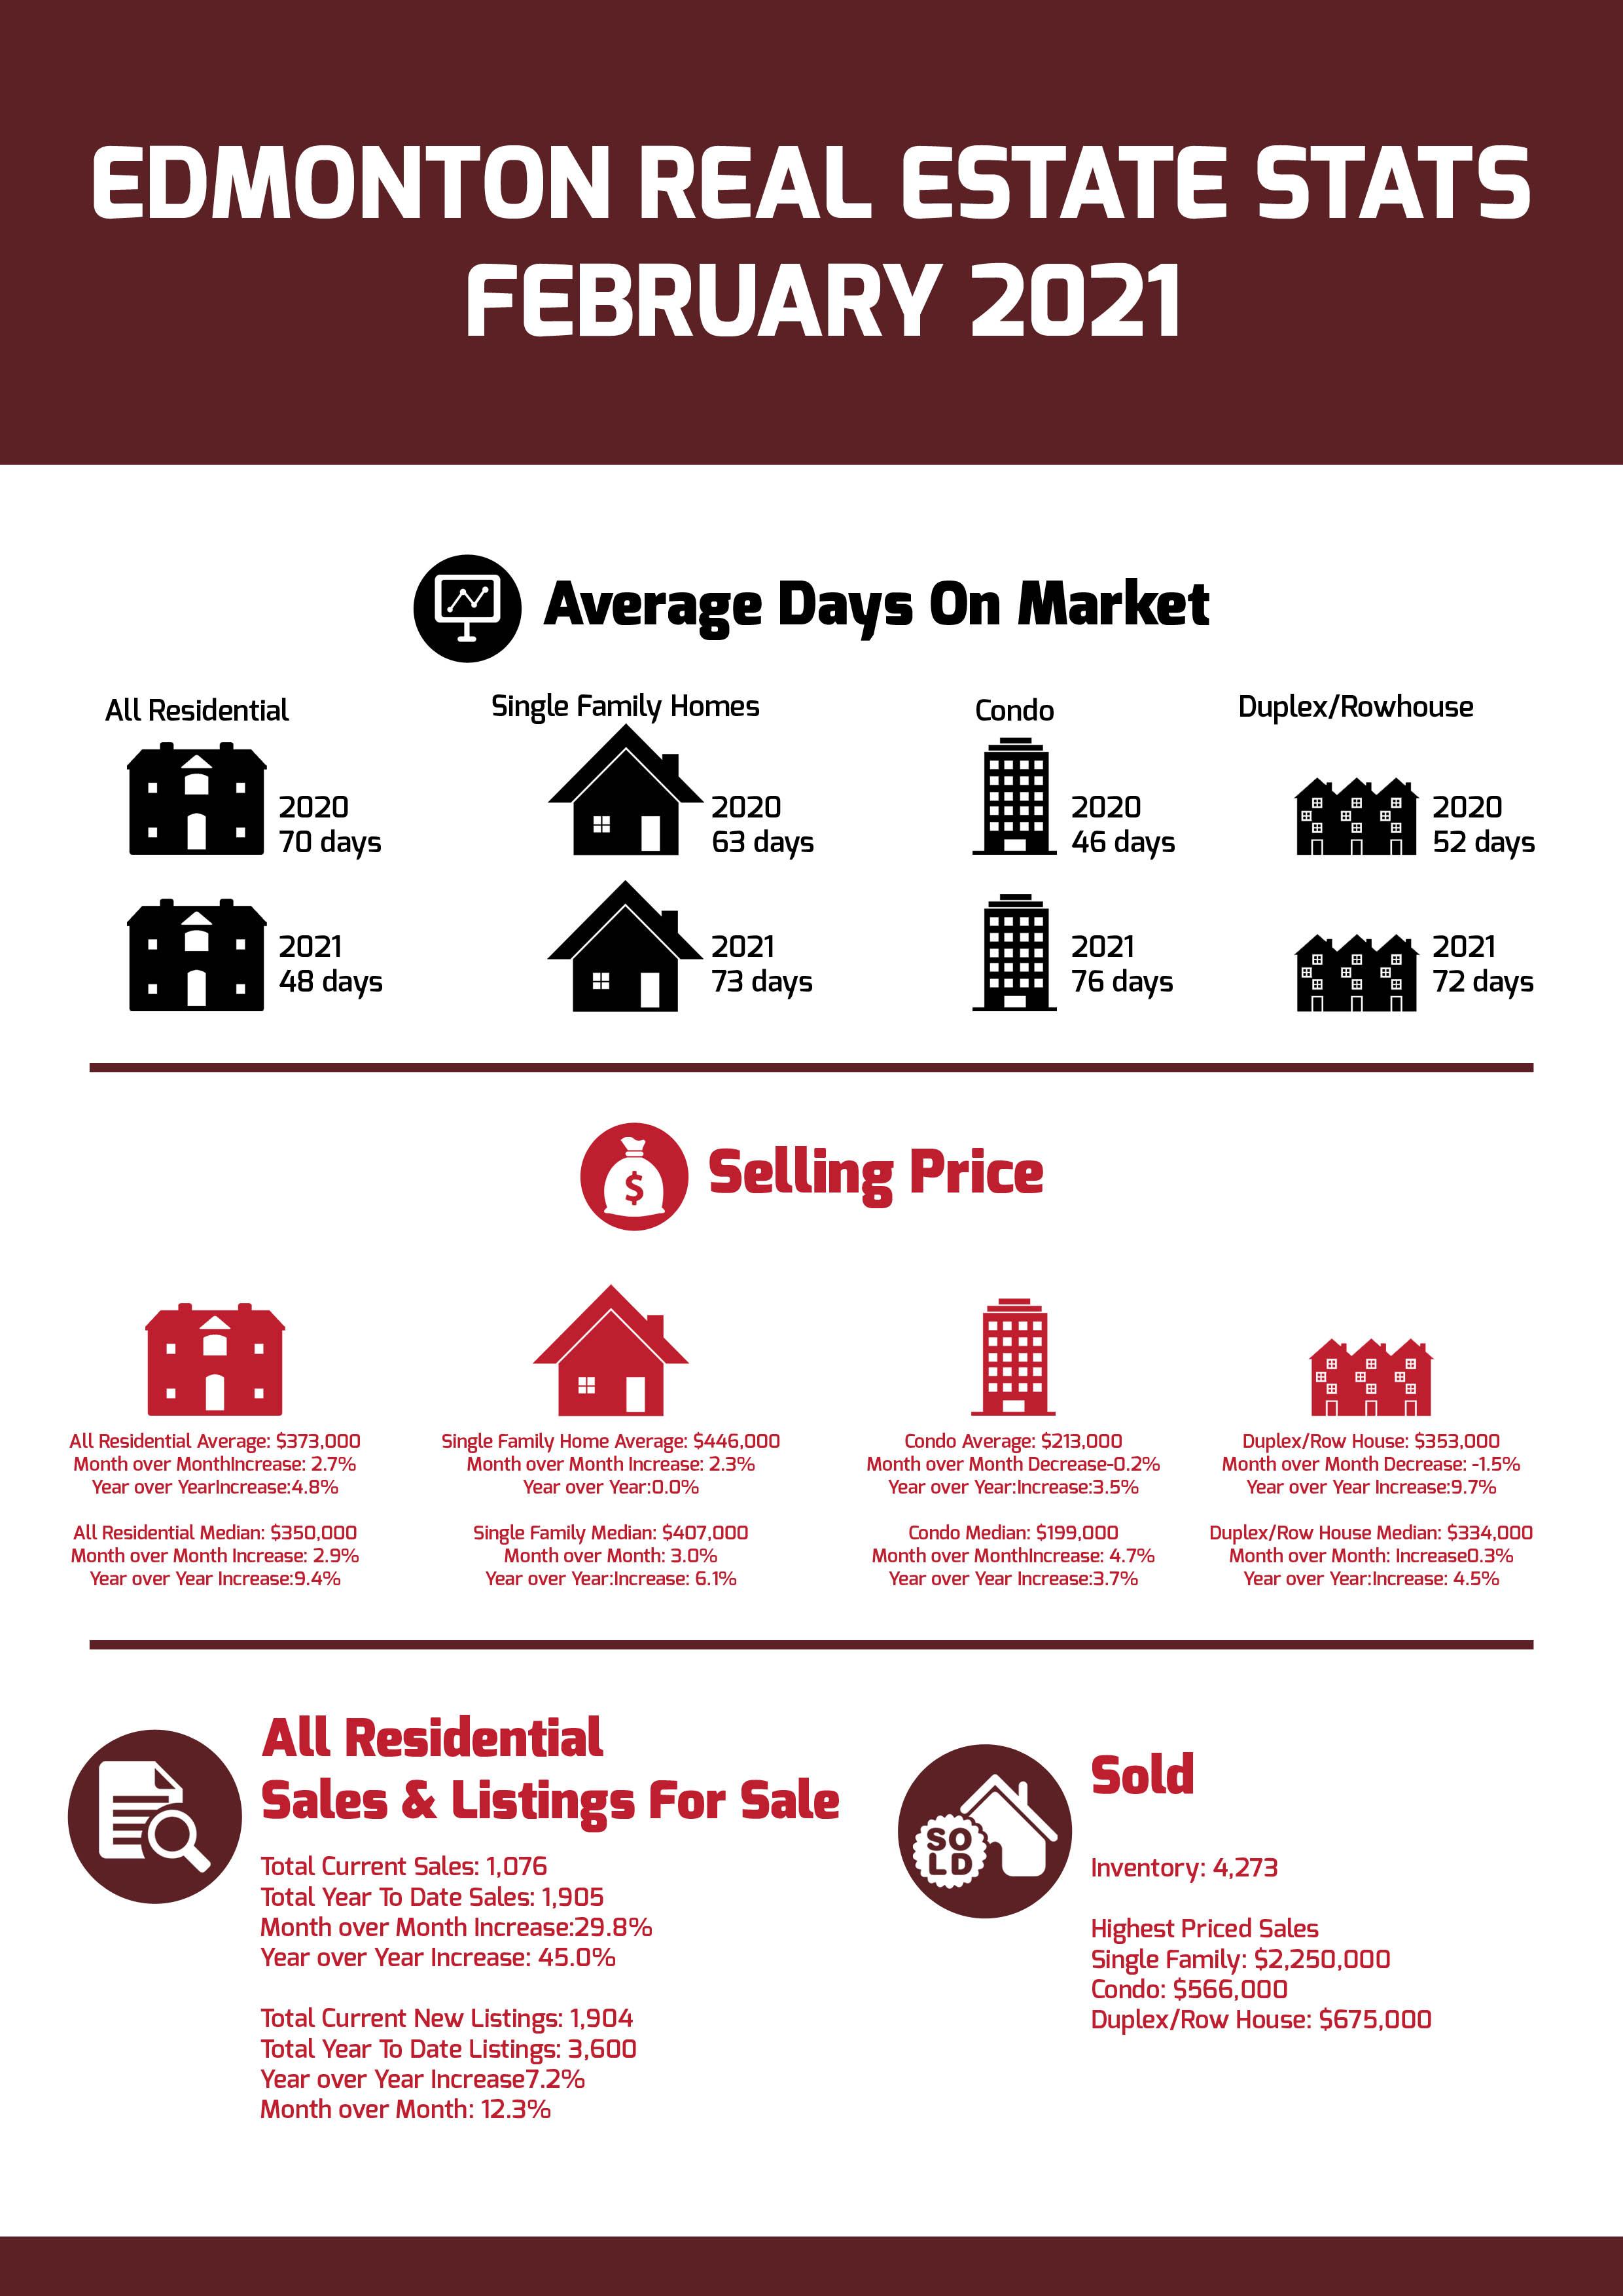 Edmonton Real Estate Stats February 2021